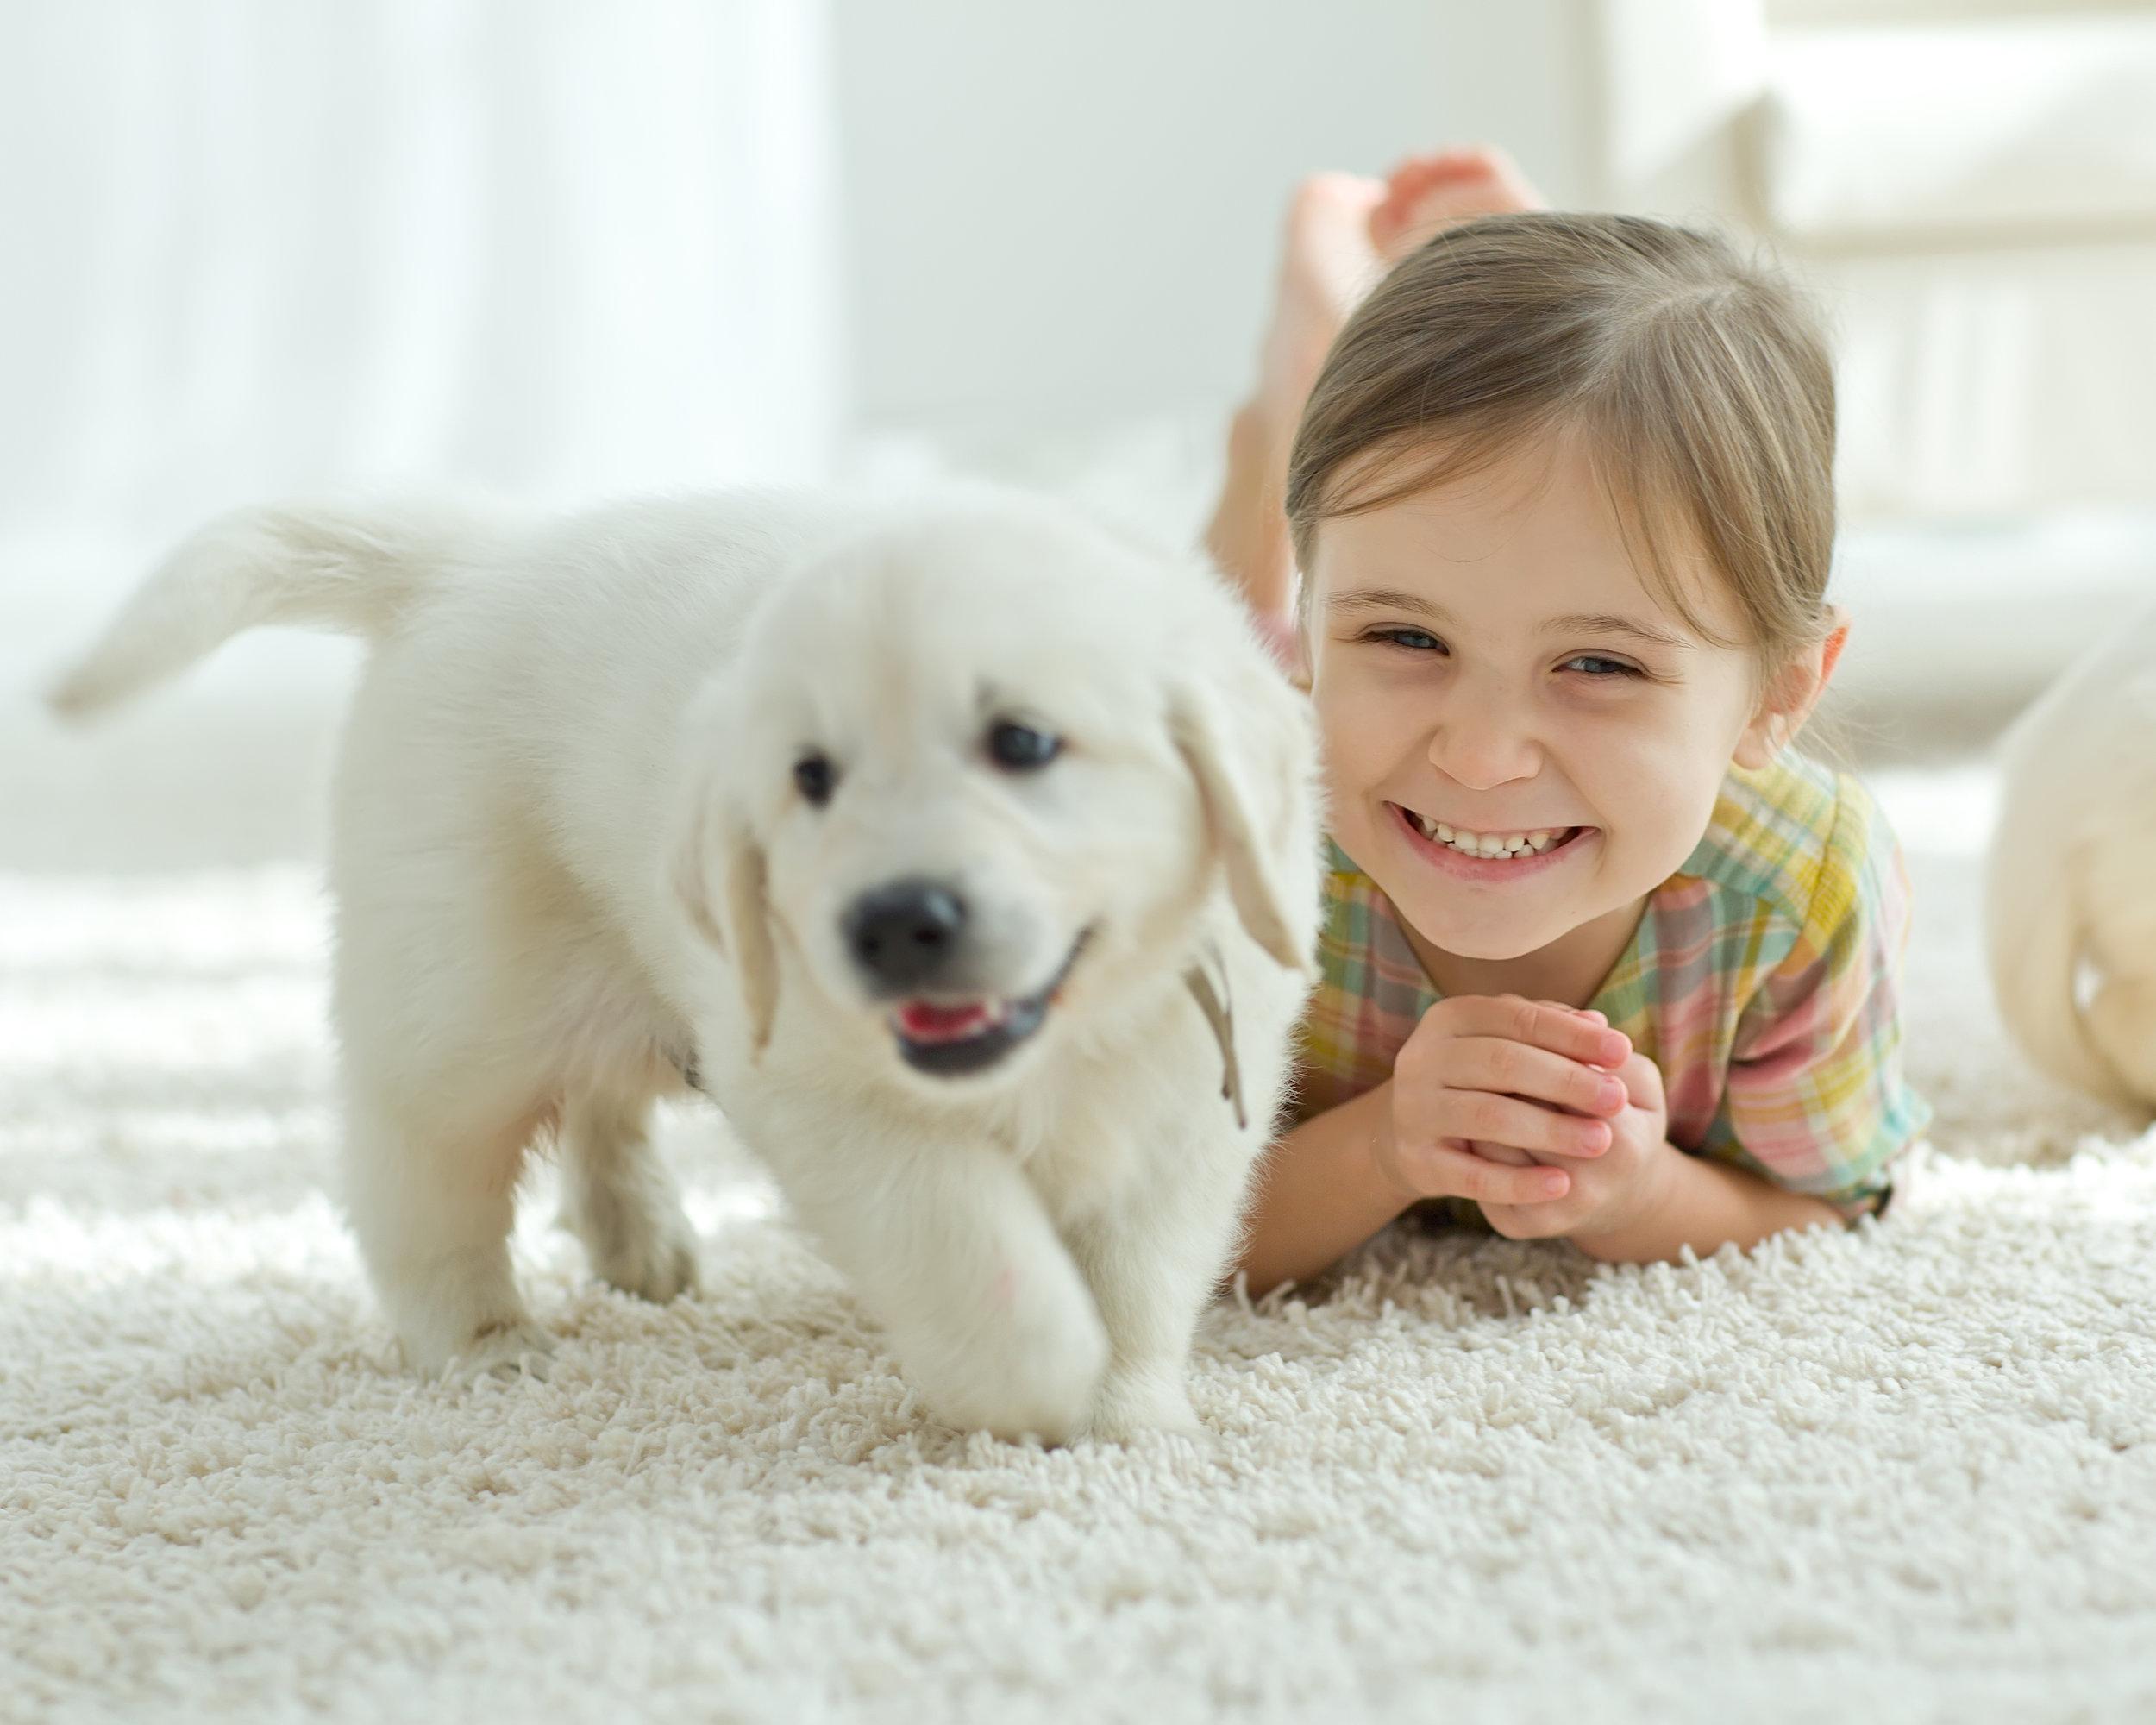 Little girl with puppy.jpg